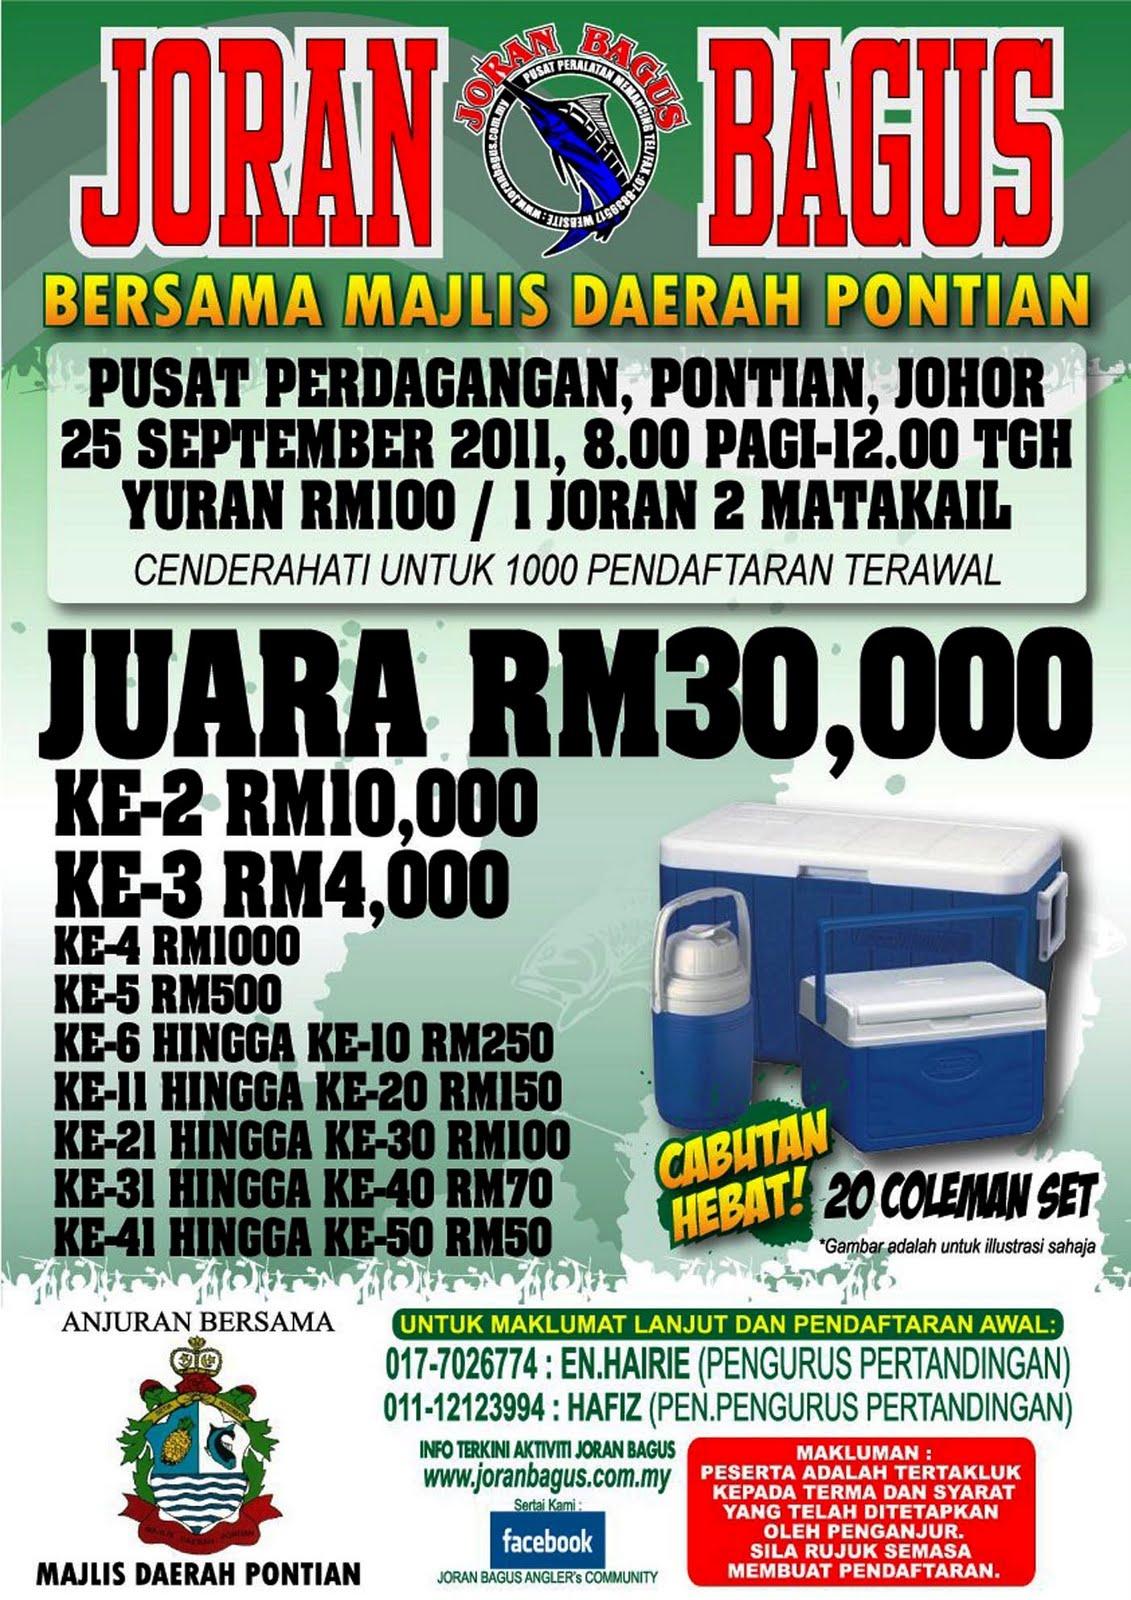 JoranPancing RM30000 Sandaran Juara Pertandingan Joran